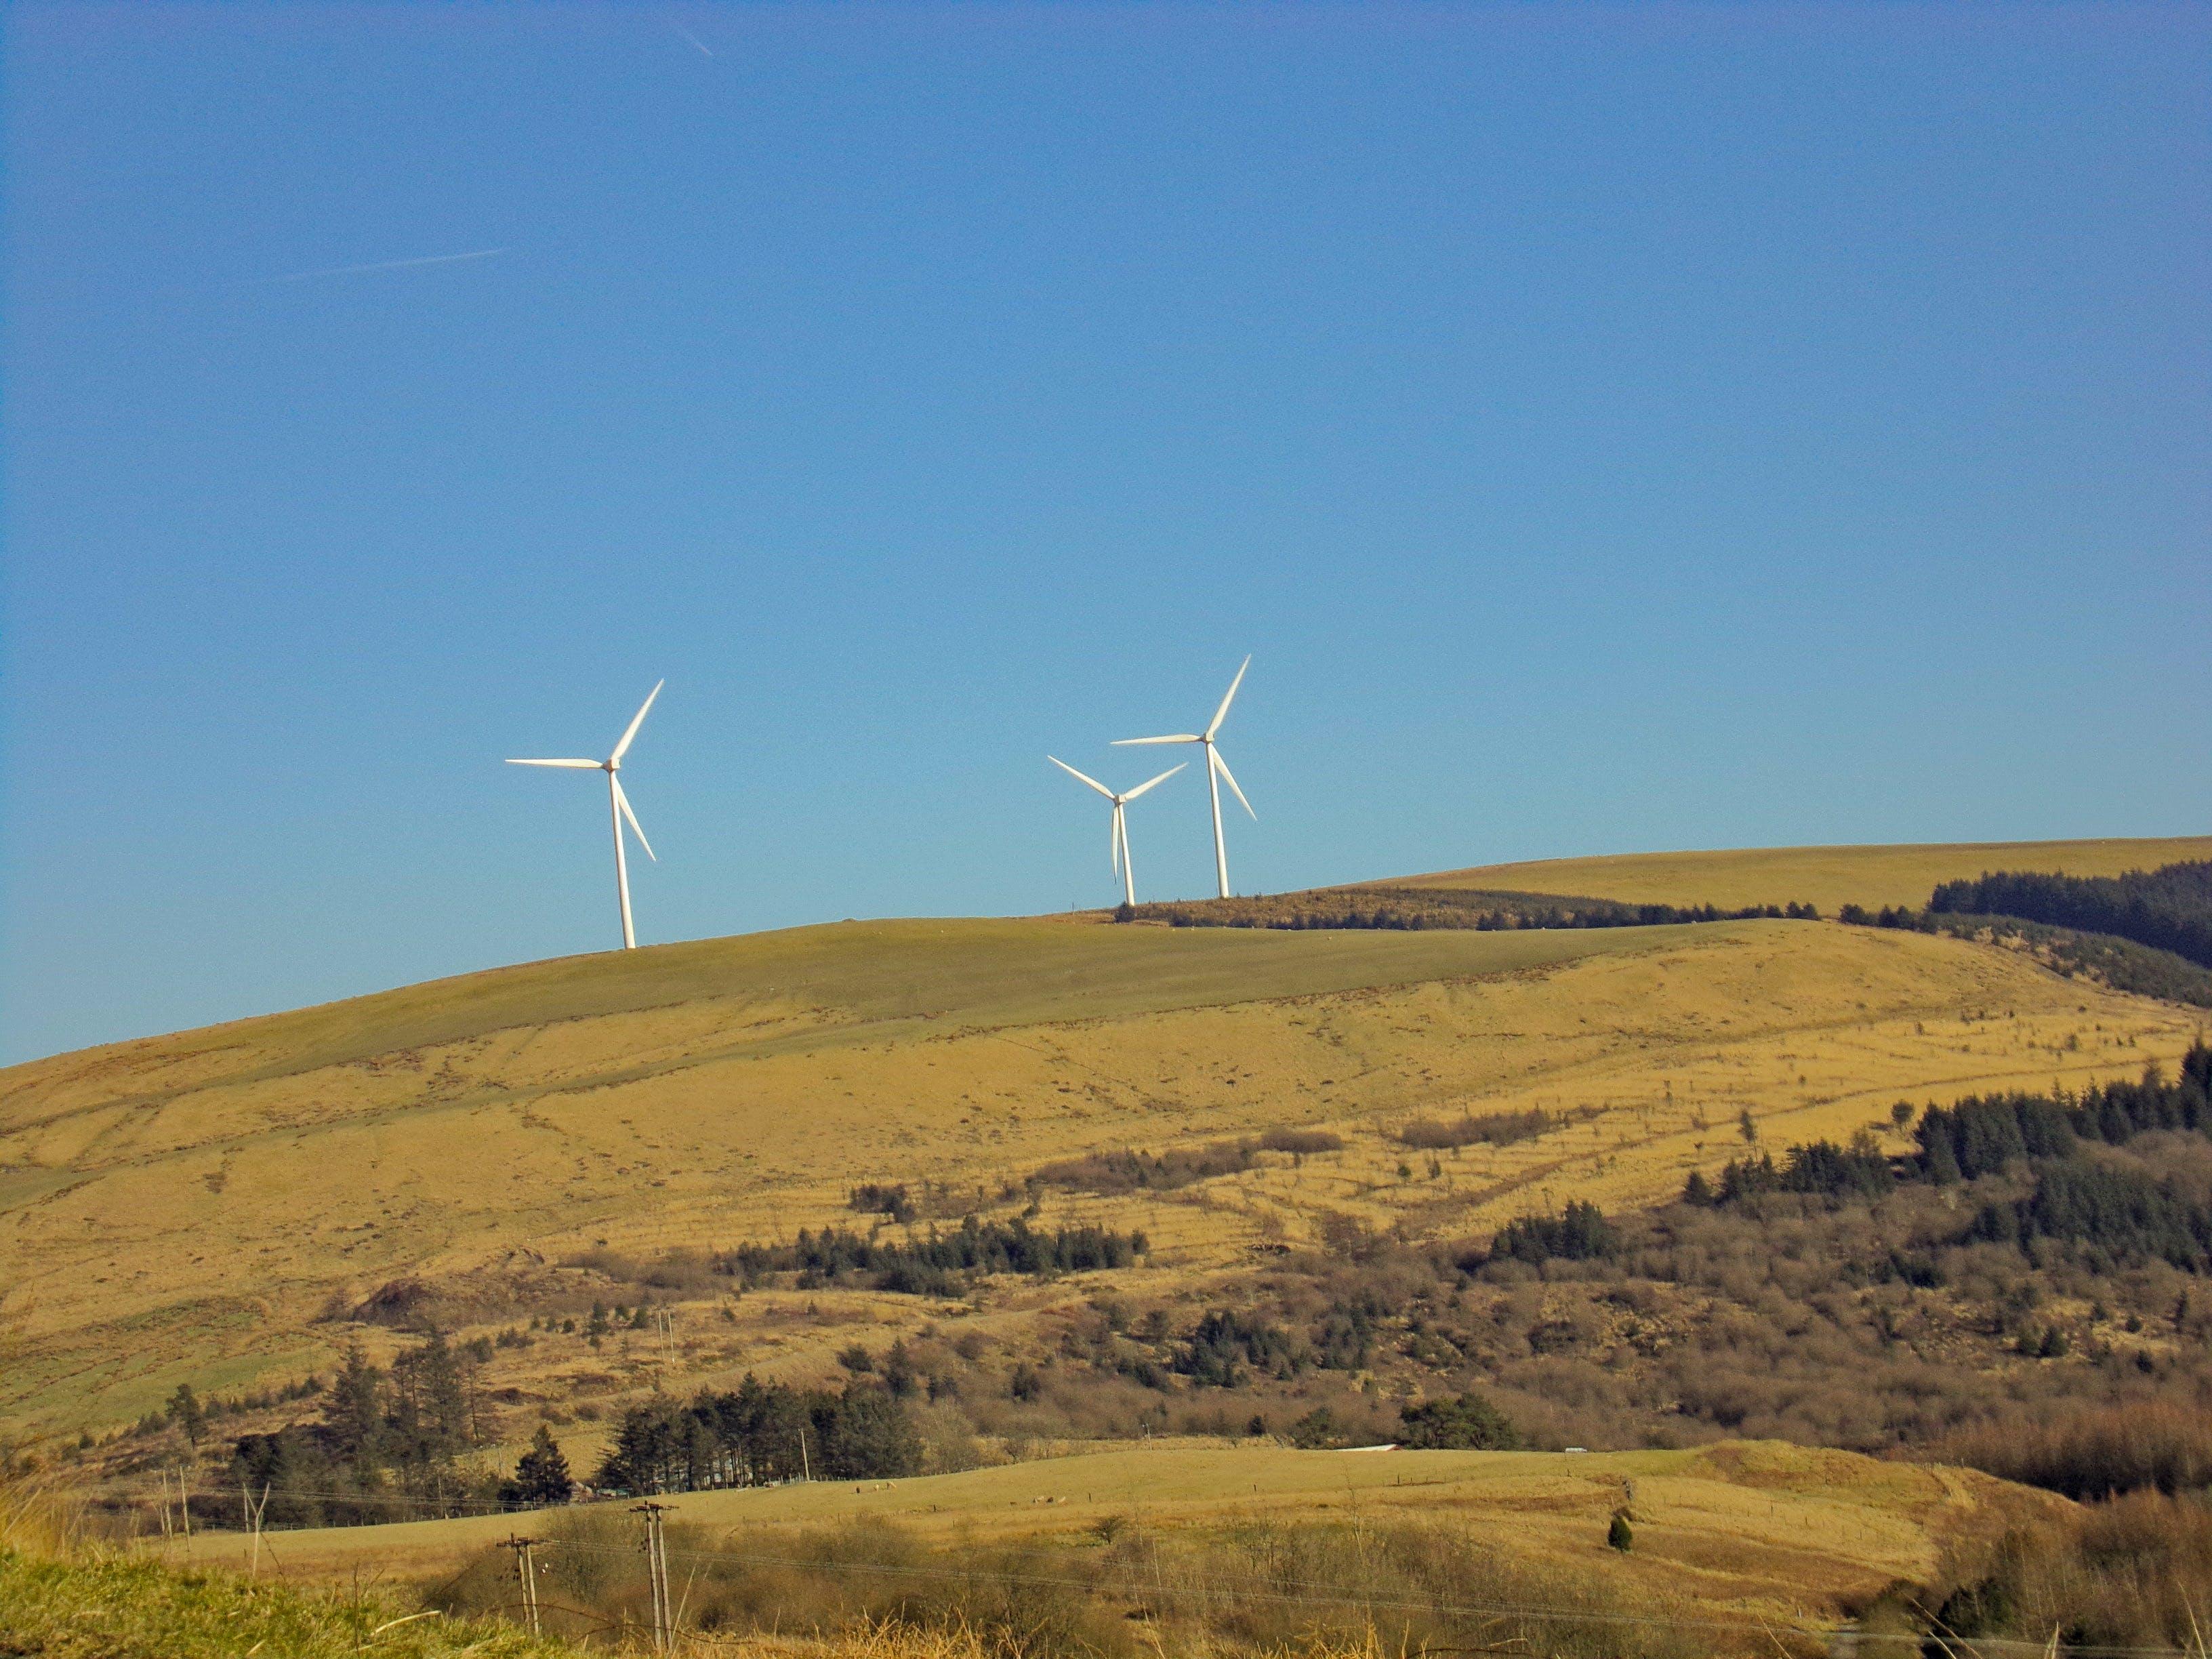 Three White Windmills on Green Field Under Blue Sky